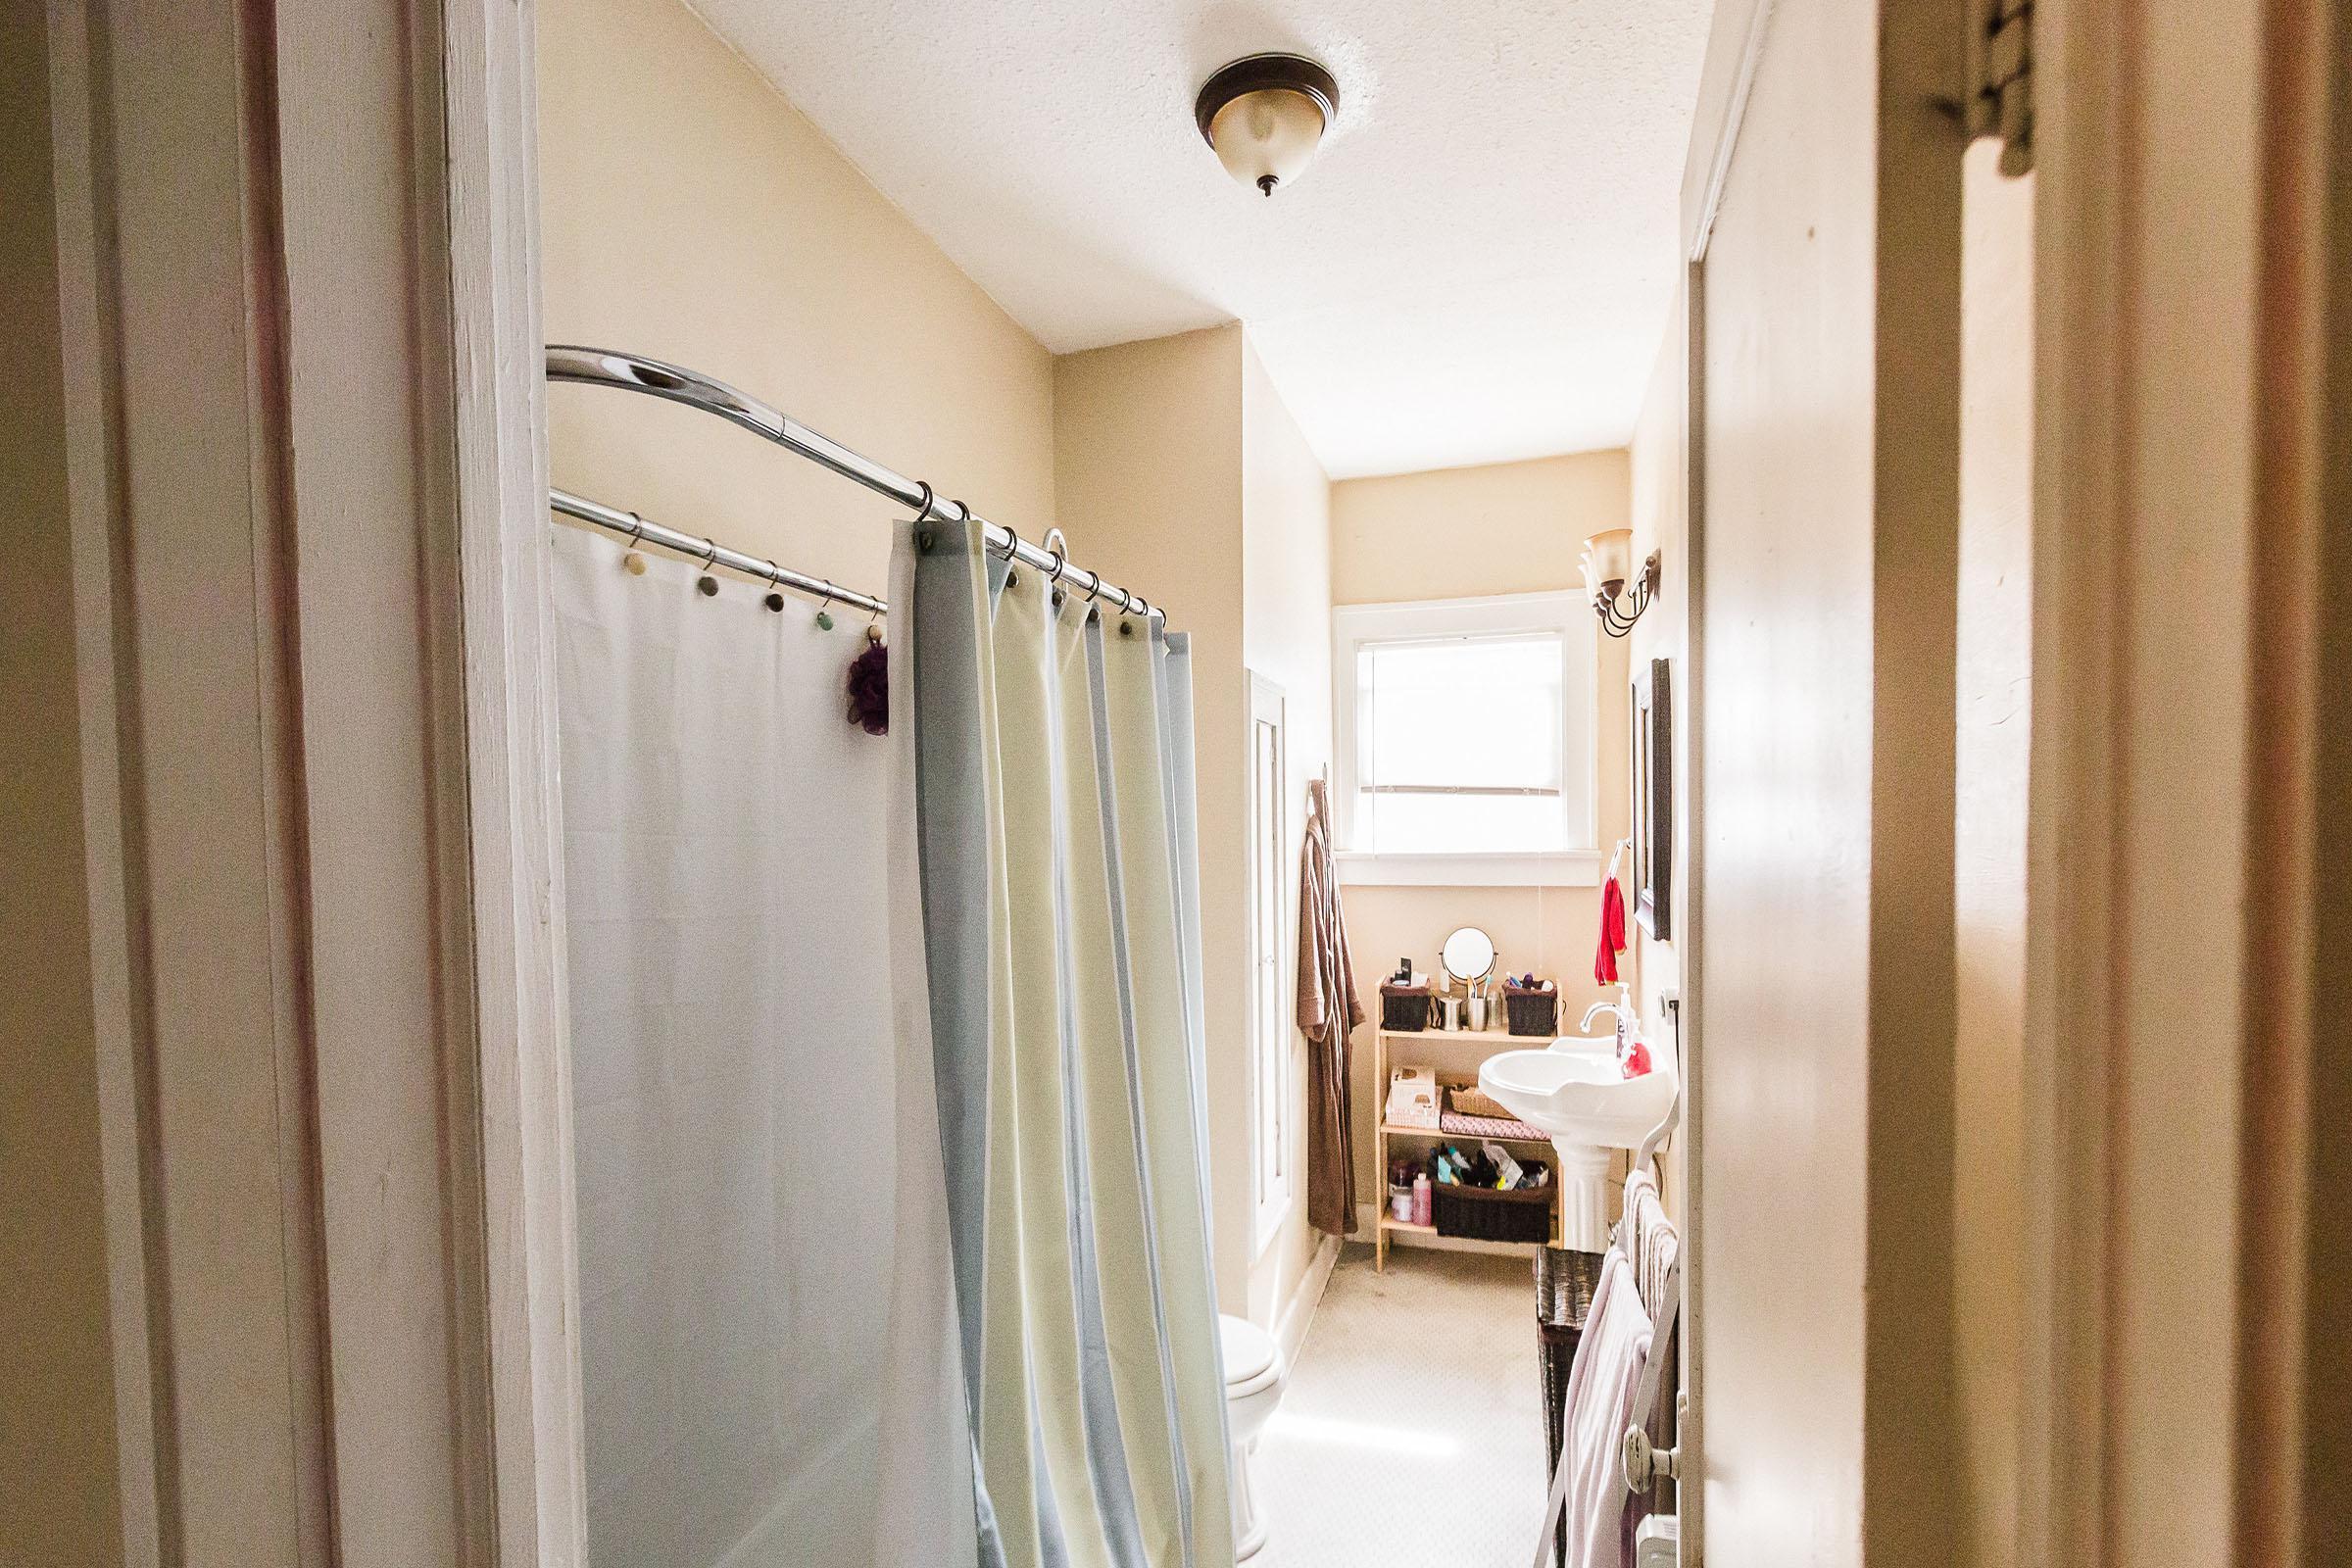 a shower curtain next to a door